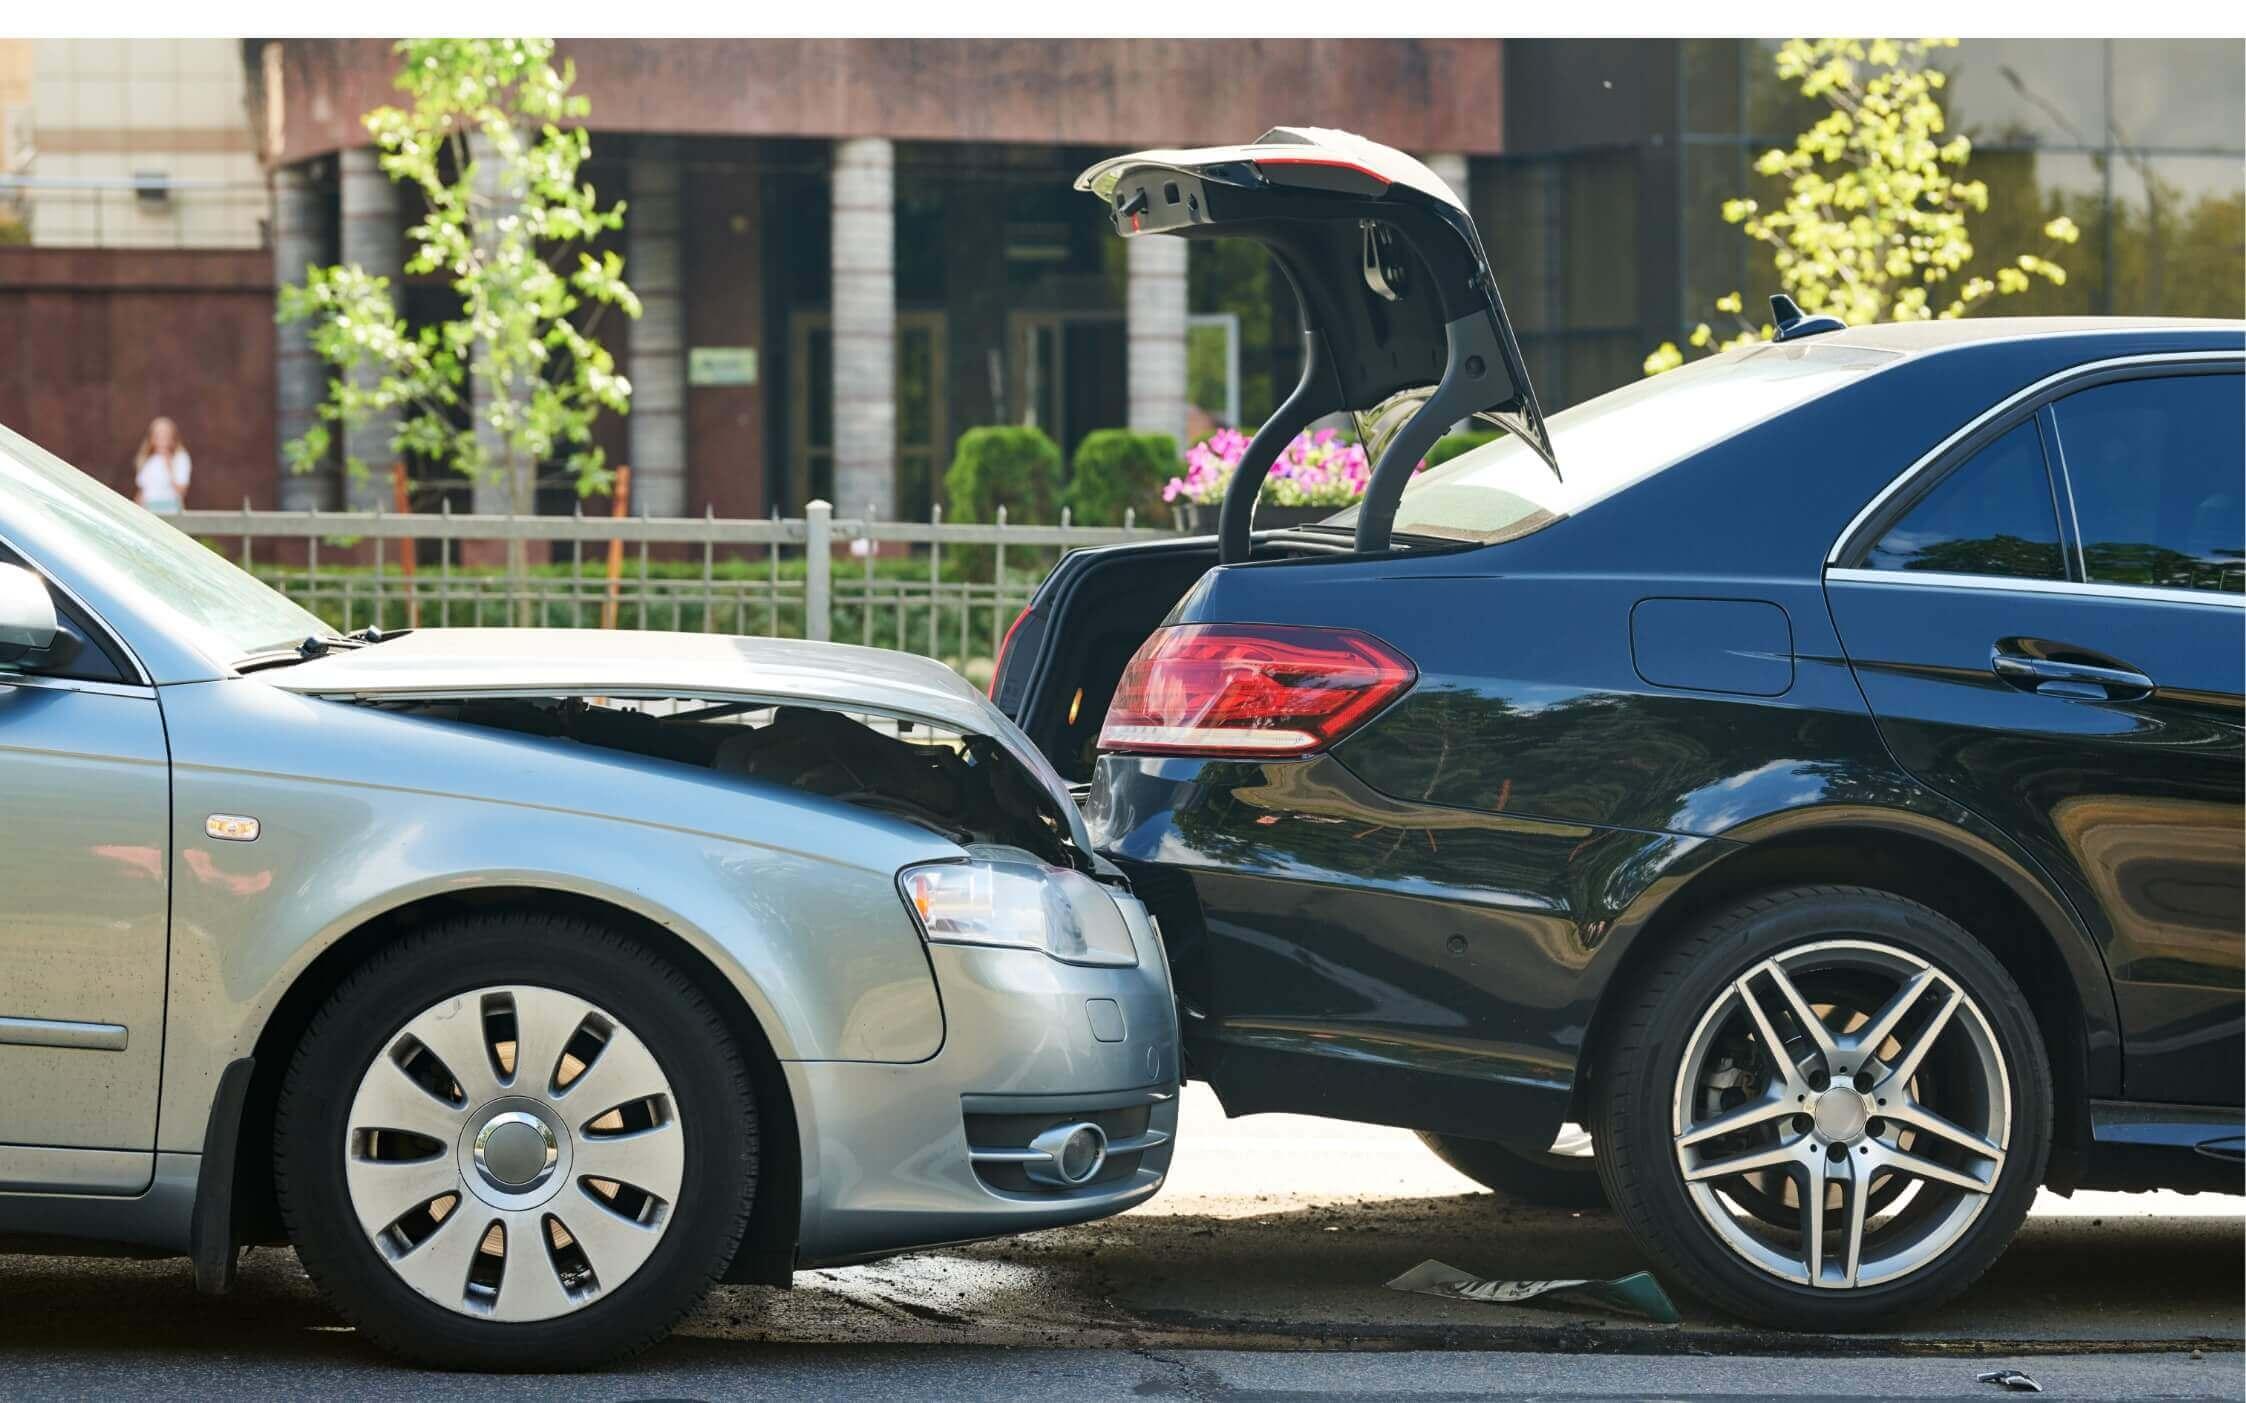 auto-collision-banner-image